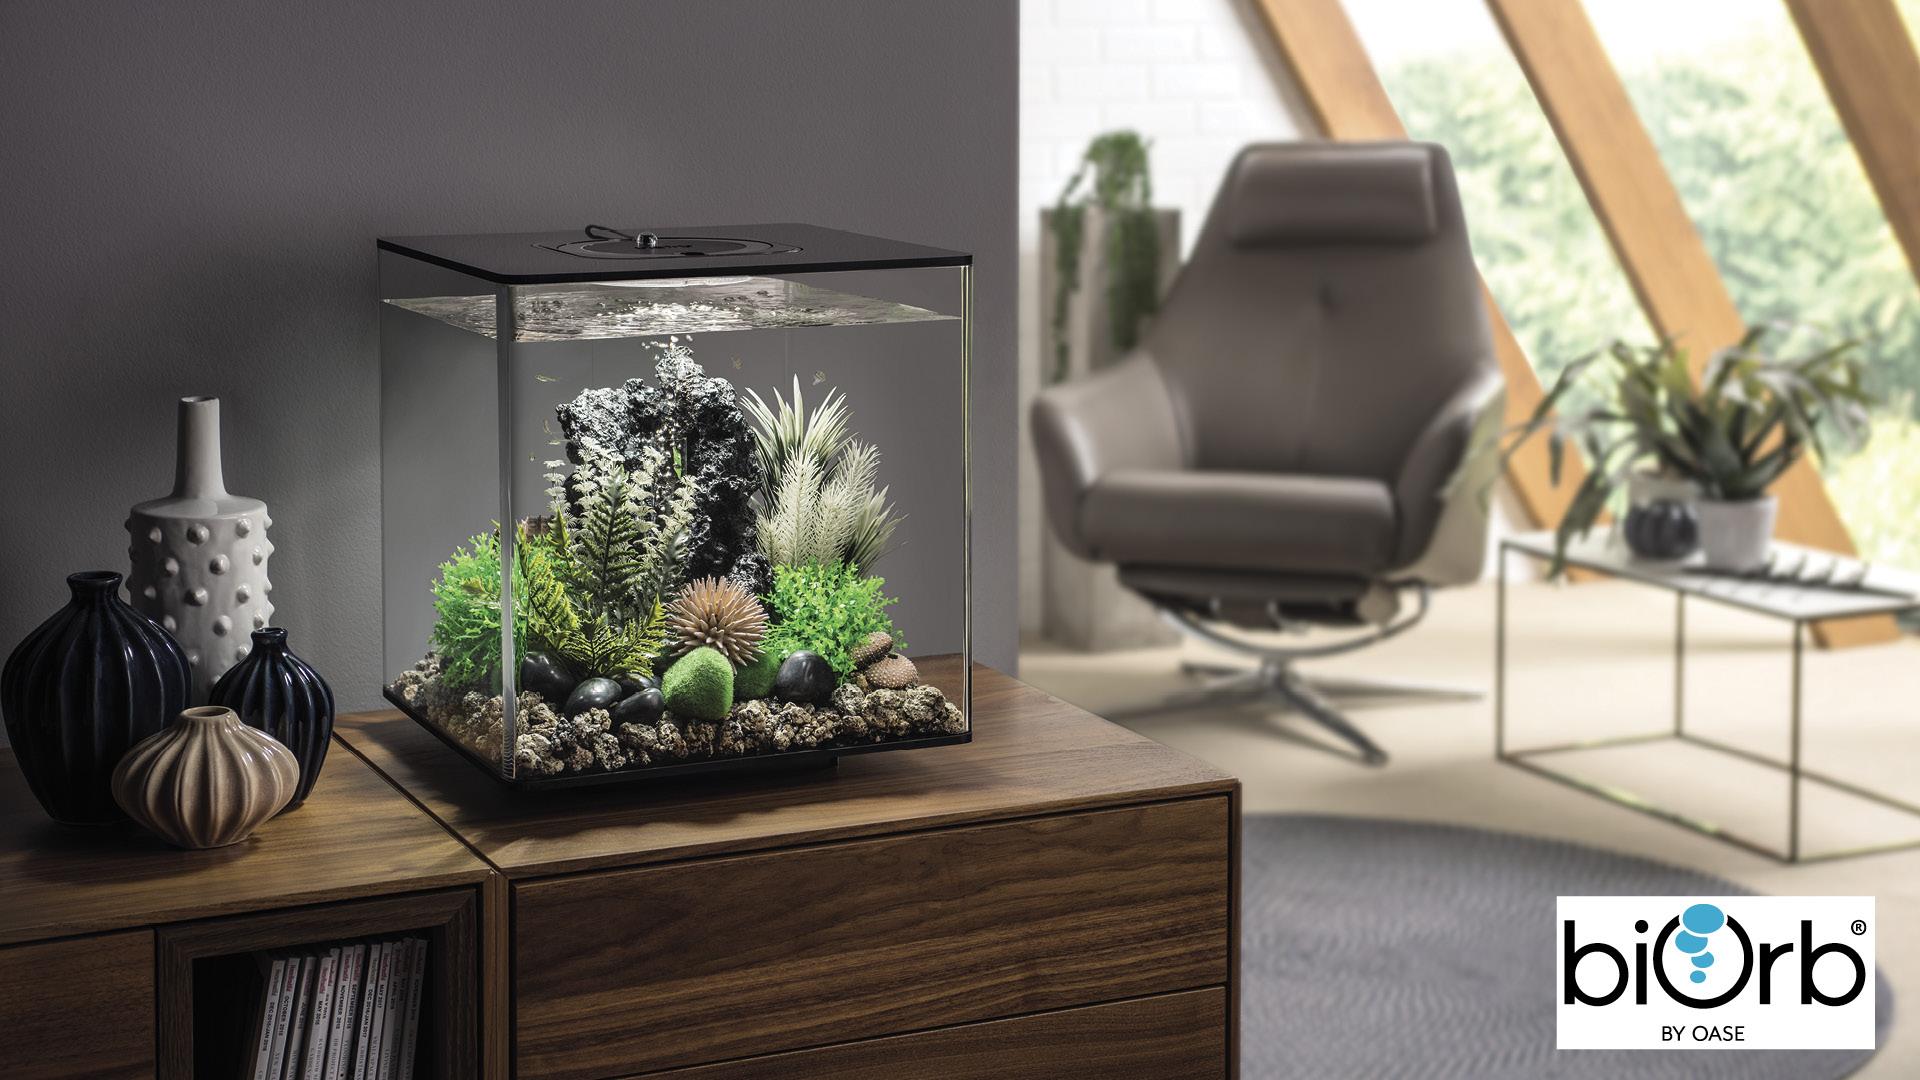 Win a biOrb CUBE aquarium Worth £224.99!